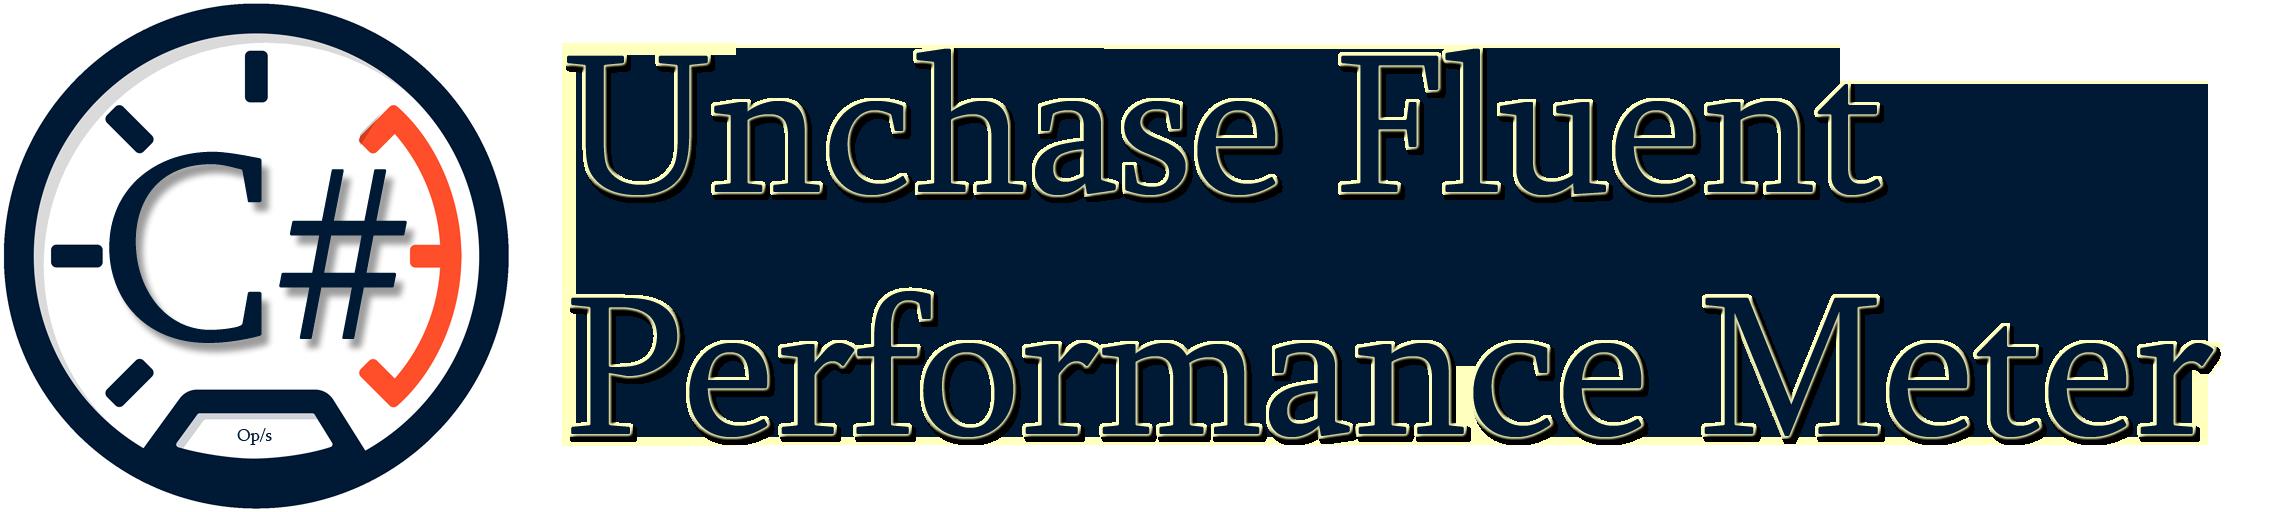 Unchase Fluent Performance Meter Logo